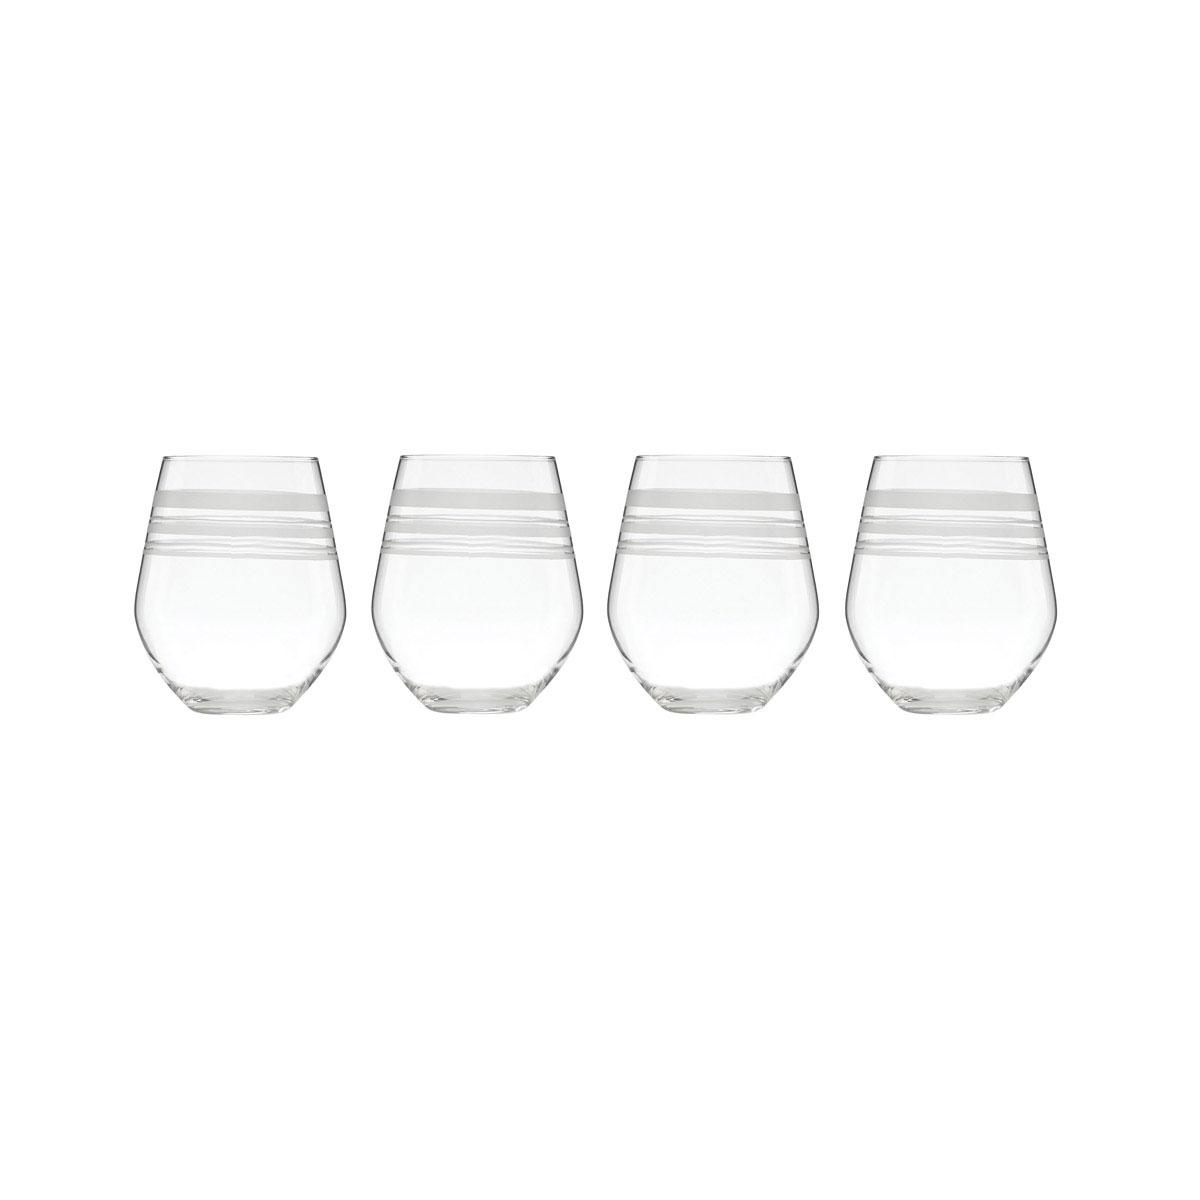 Kate Spade New York, Lenox Library Stripe Stemless Crystal White Wine, Set of 4